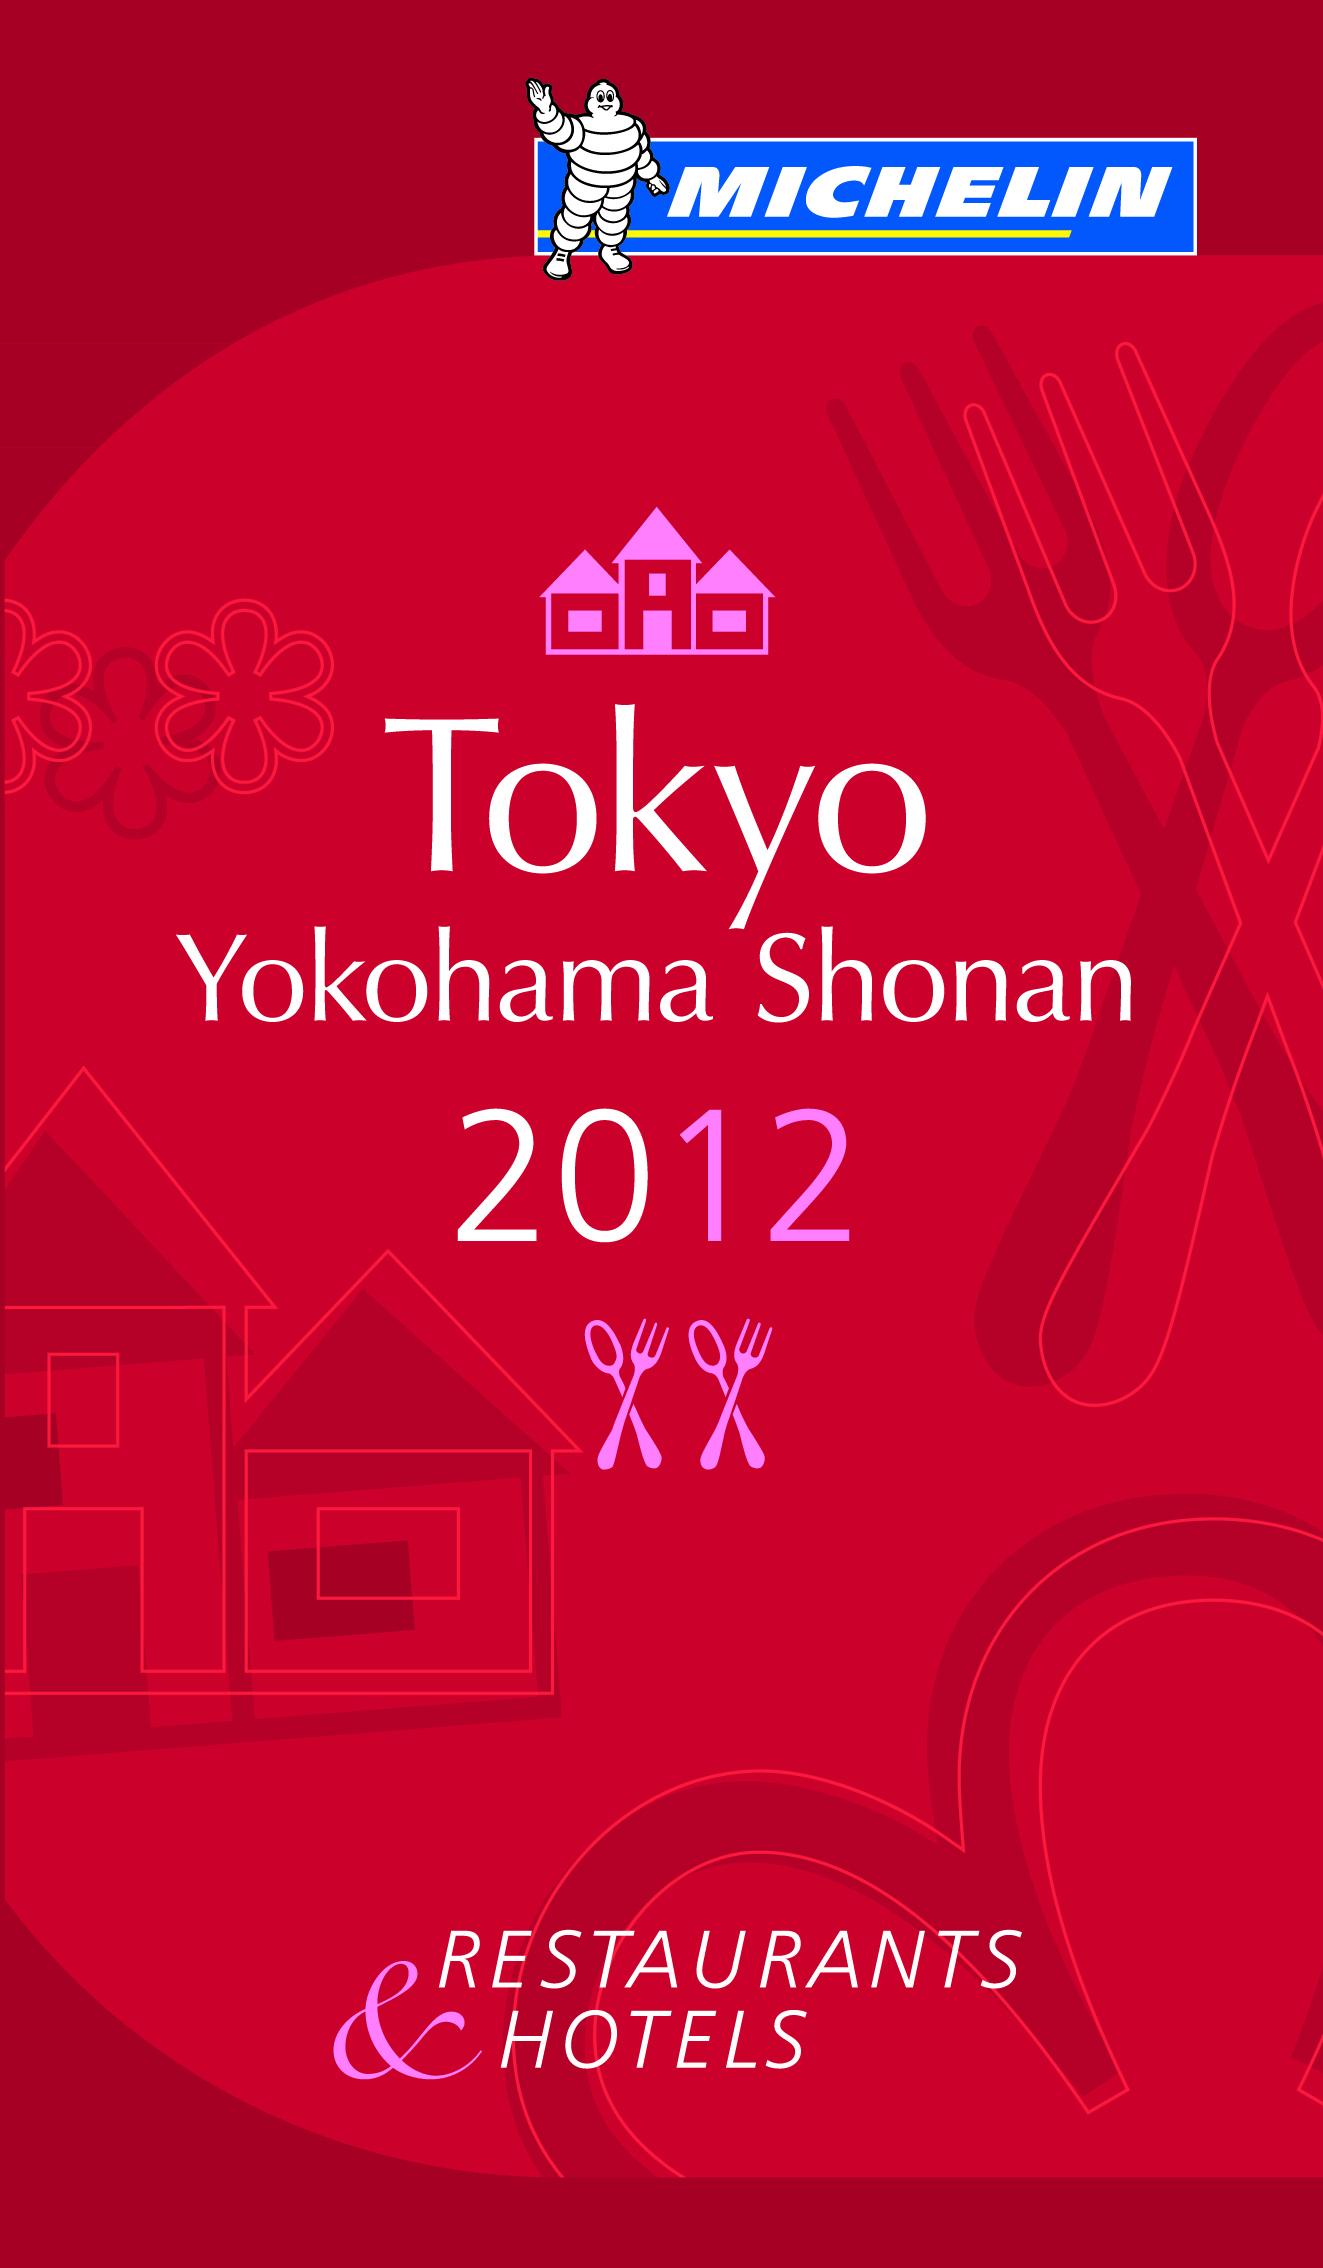 GUIDE MICHELIN TOKYO YOKOHAMA SHONAN 2012